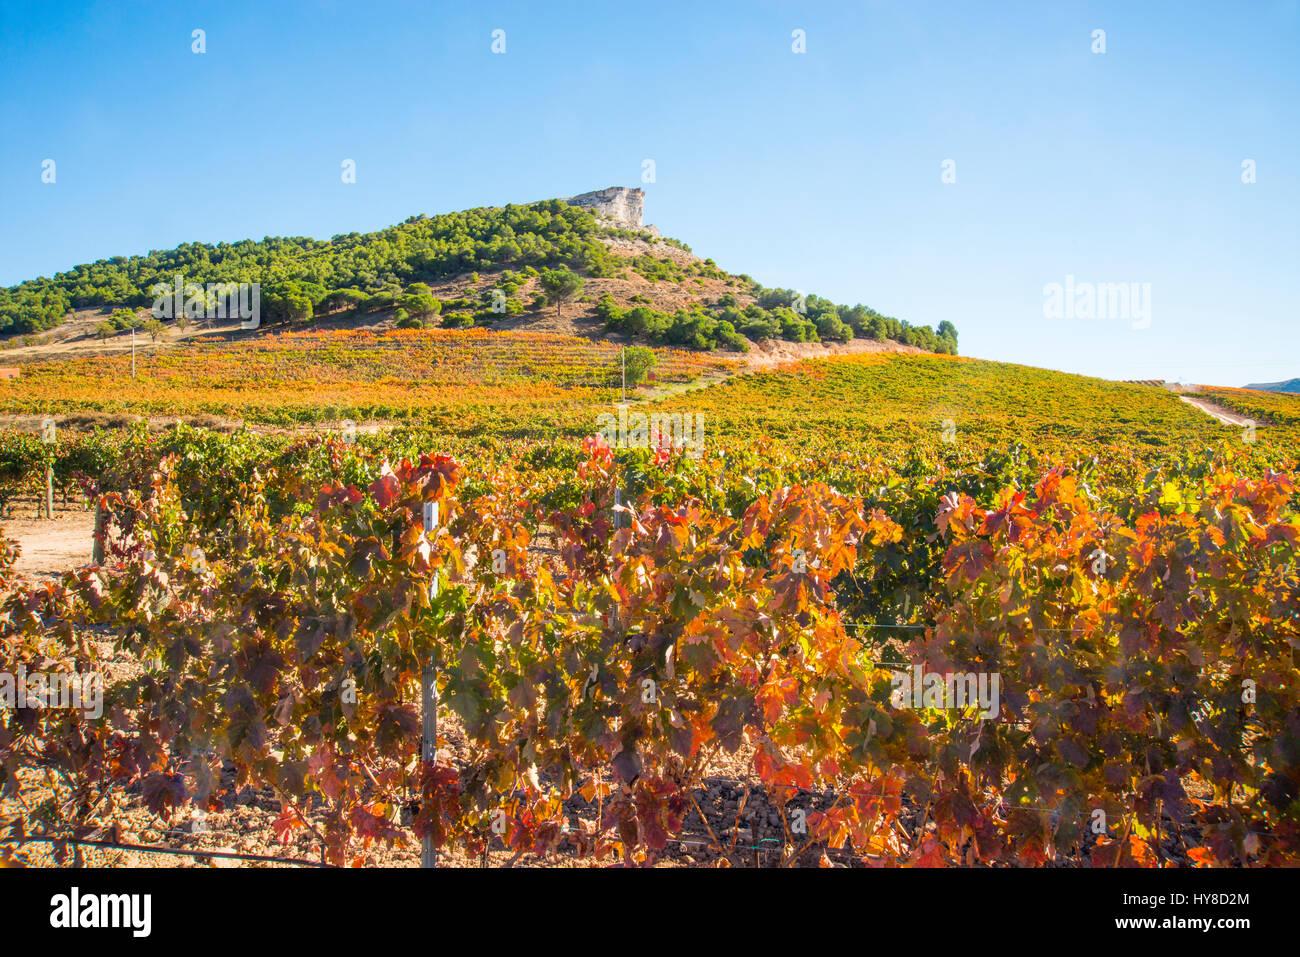 Vineyards in Autumn. Ribera del Duero, Valladolid province, Castilla Leon, Spain. - Stock Image